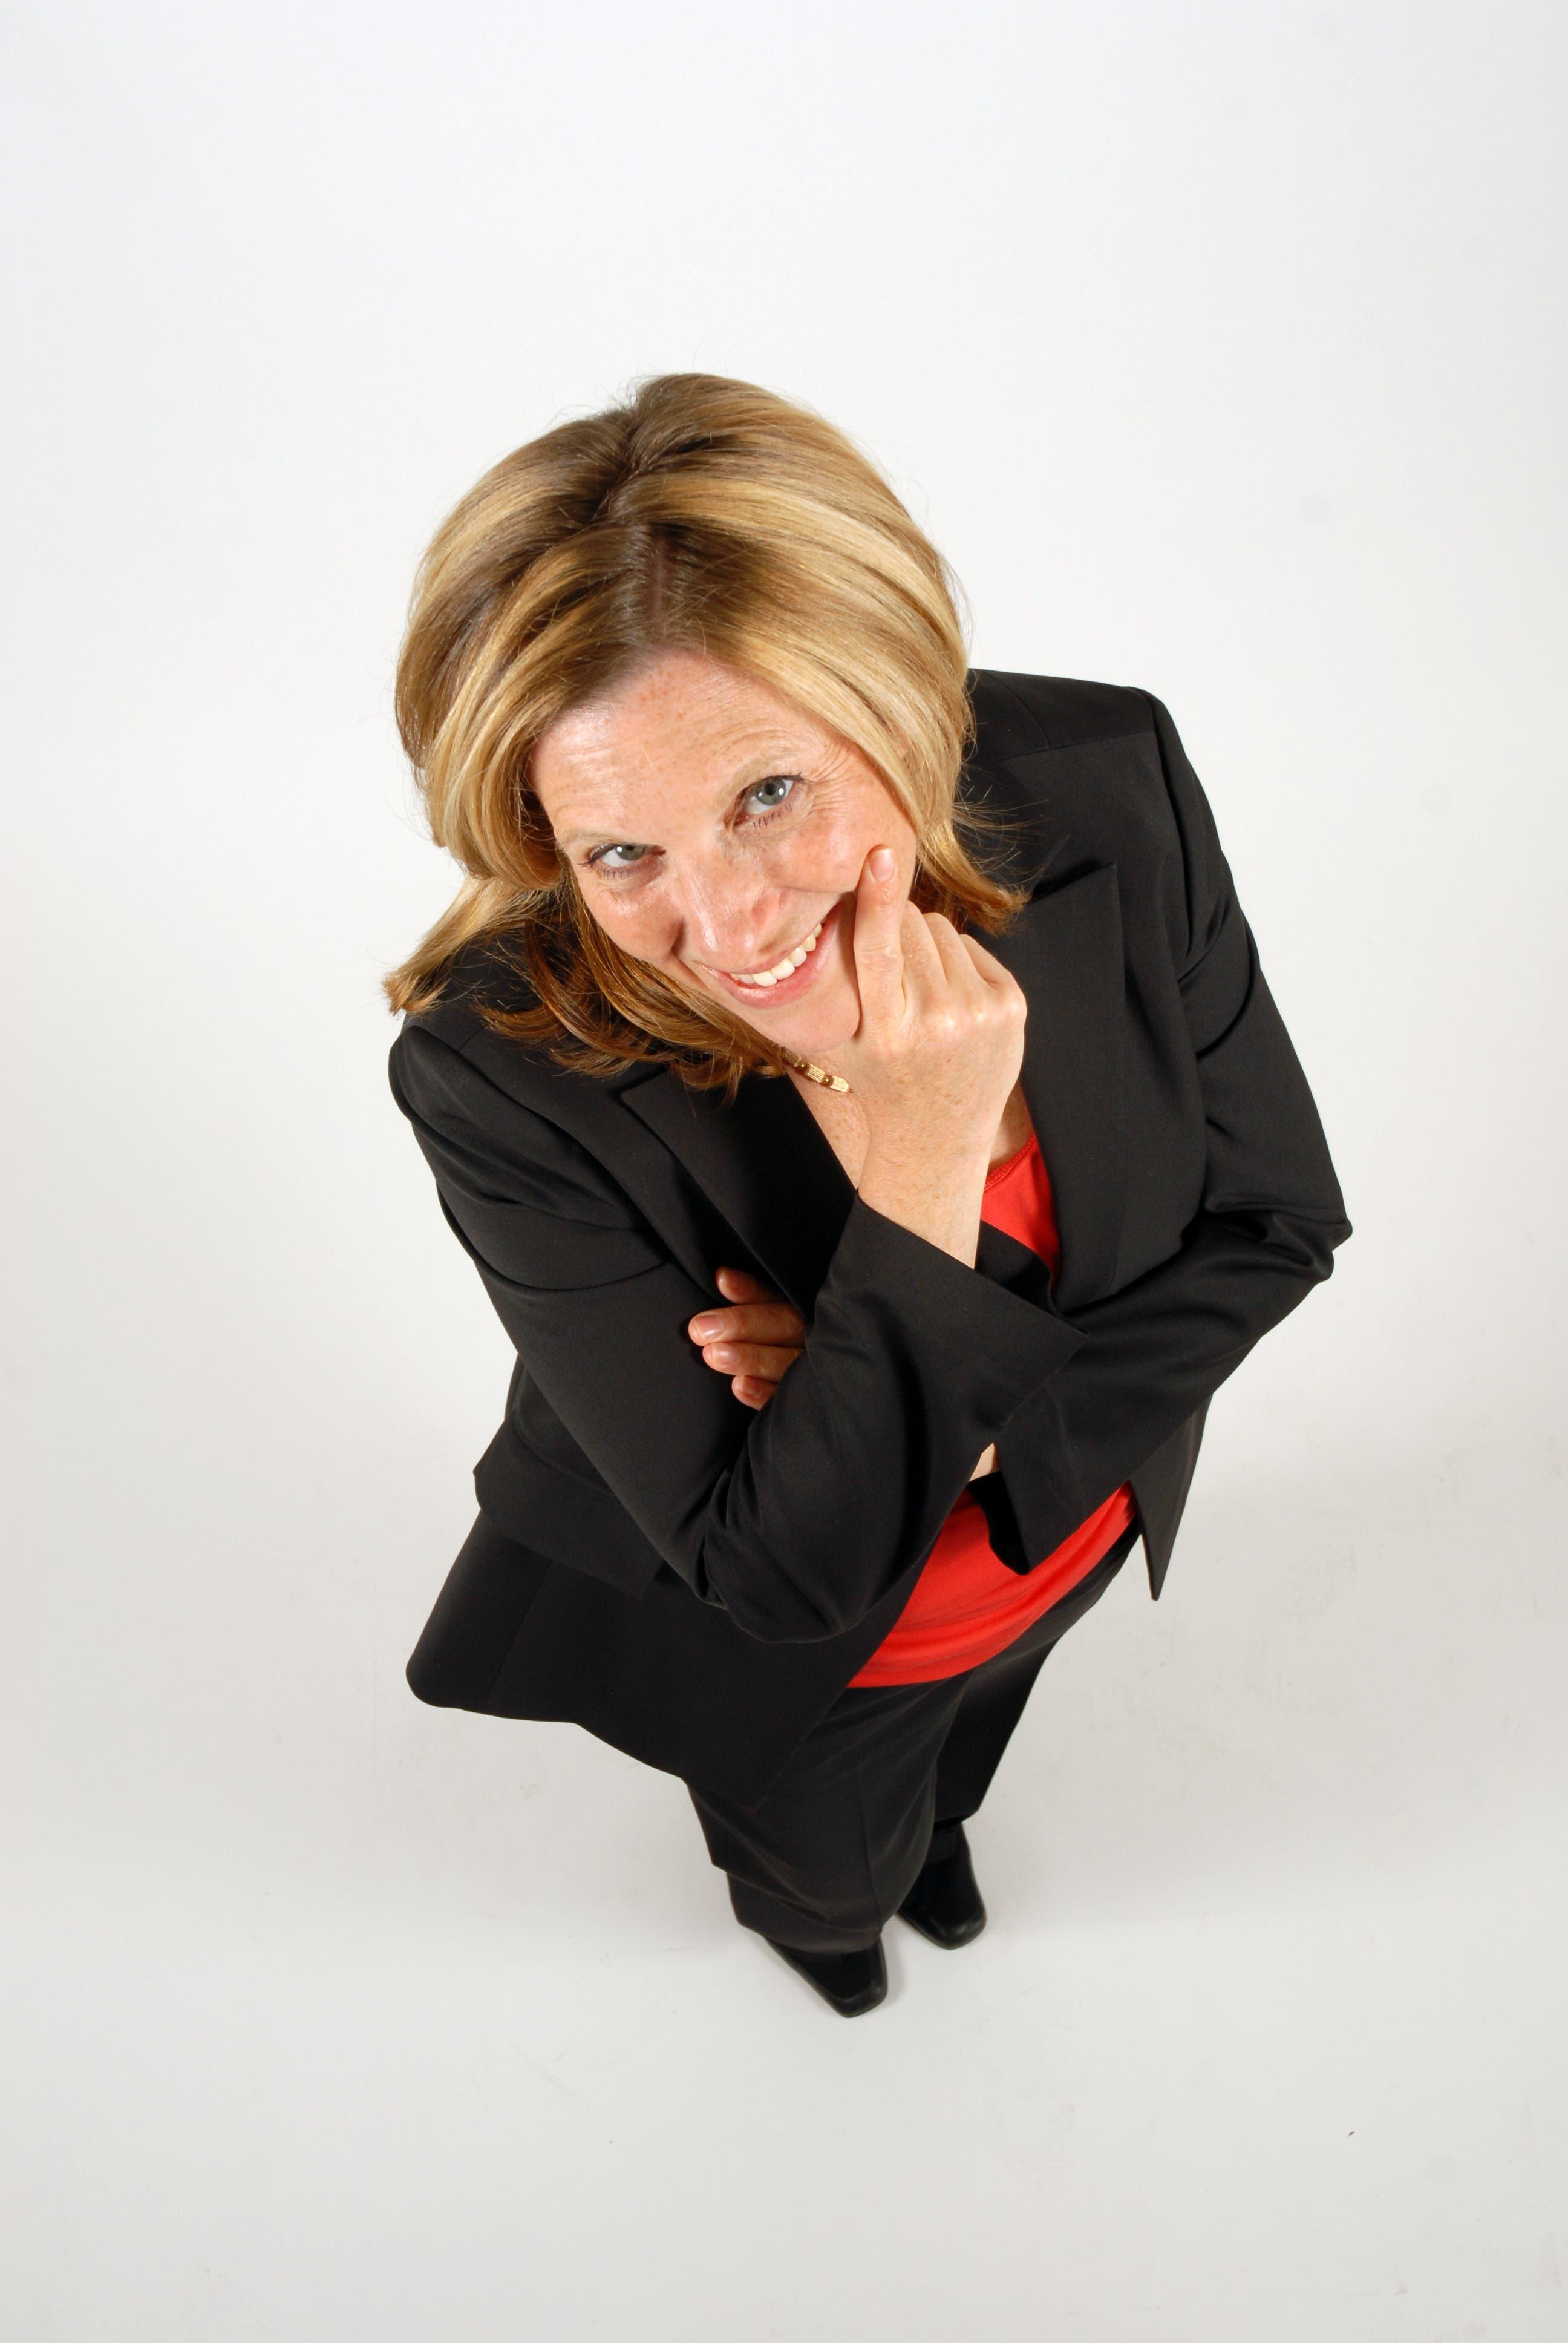 Key Hyundai Milford >> Jill Merriam of Key Hyundai of Milford At Aldarios, Tuesday Oct. 7 | Milford, CT Patch